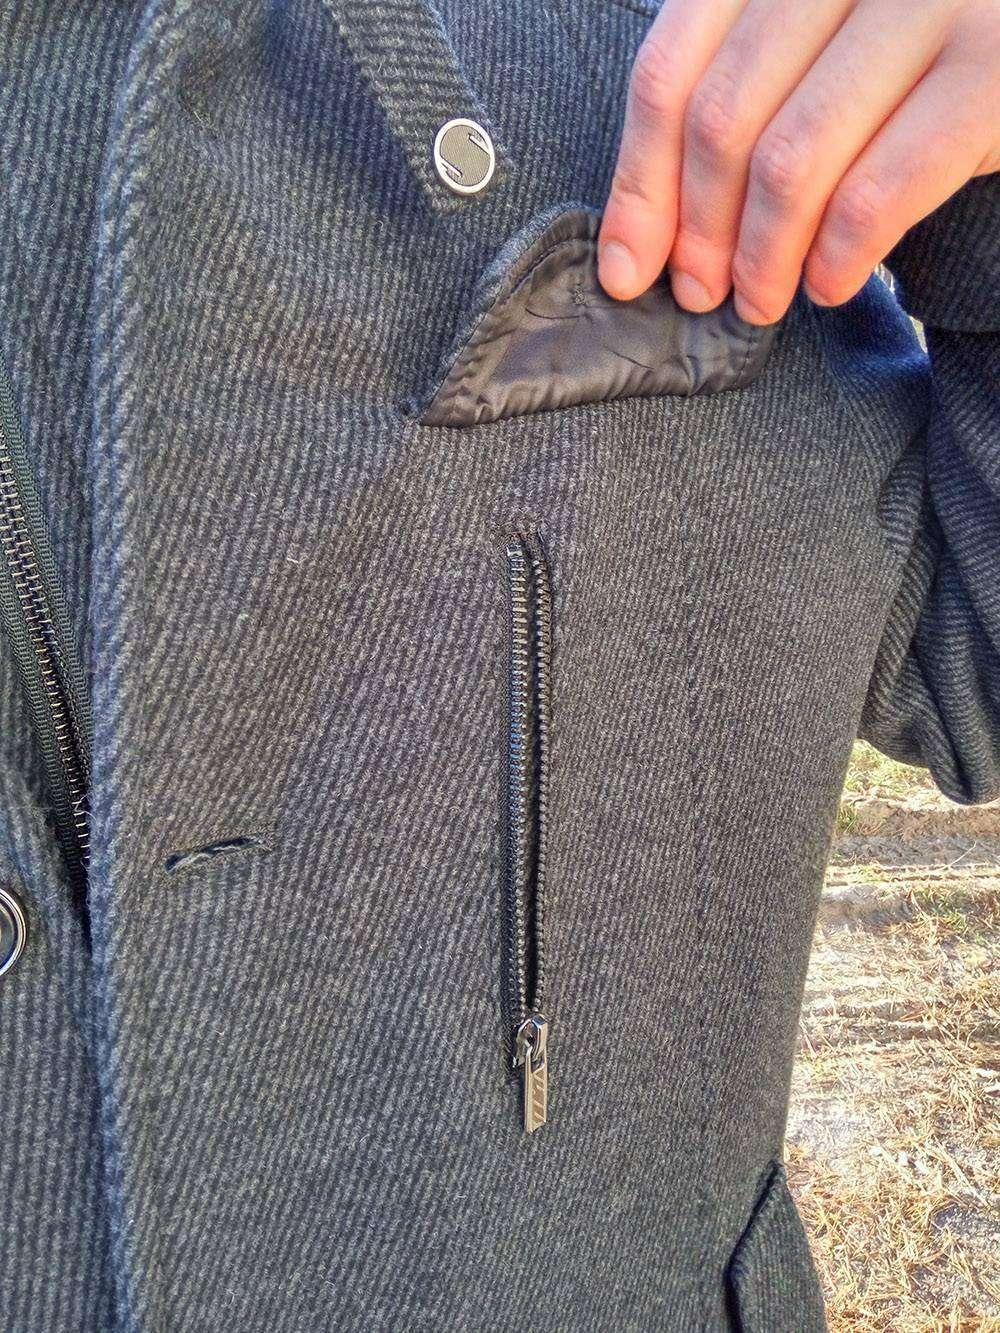 Aliexpress: Хорошее пальто из Китая